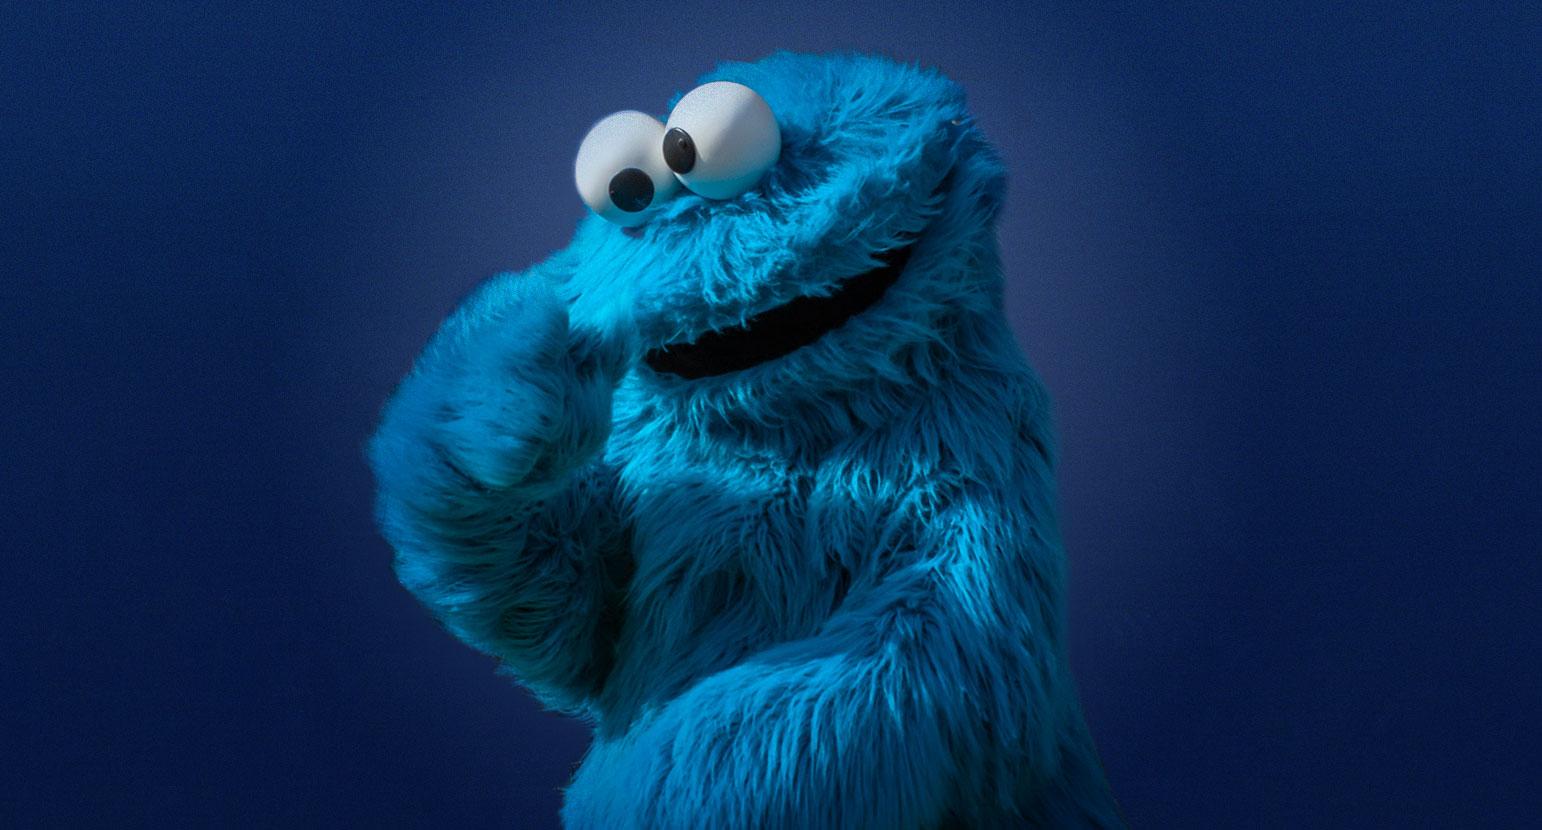 Cookiepocalypse is coming, cookie monster thinking